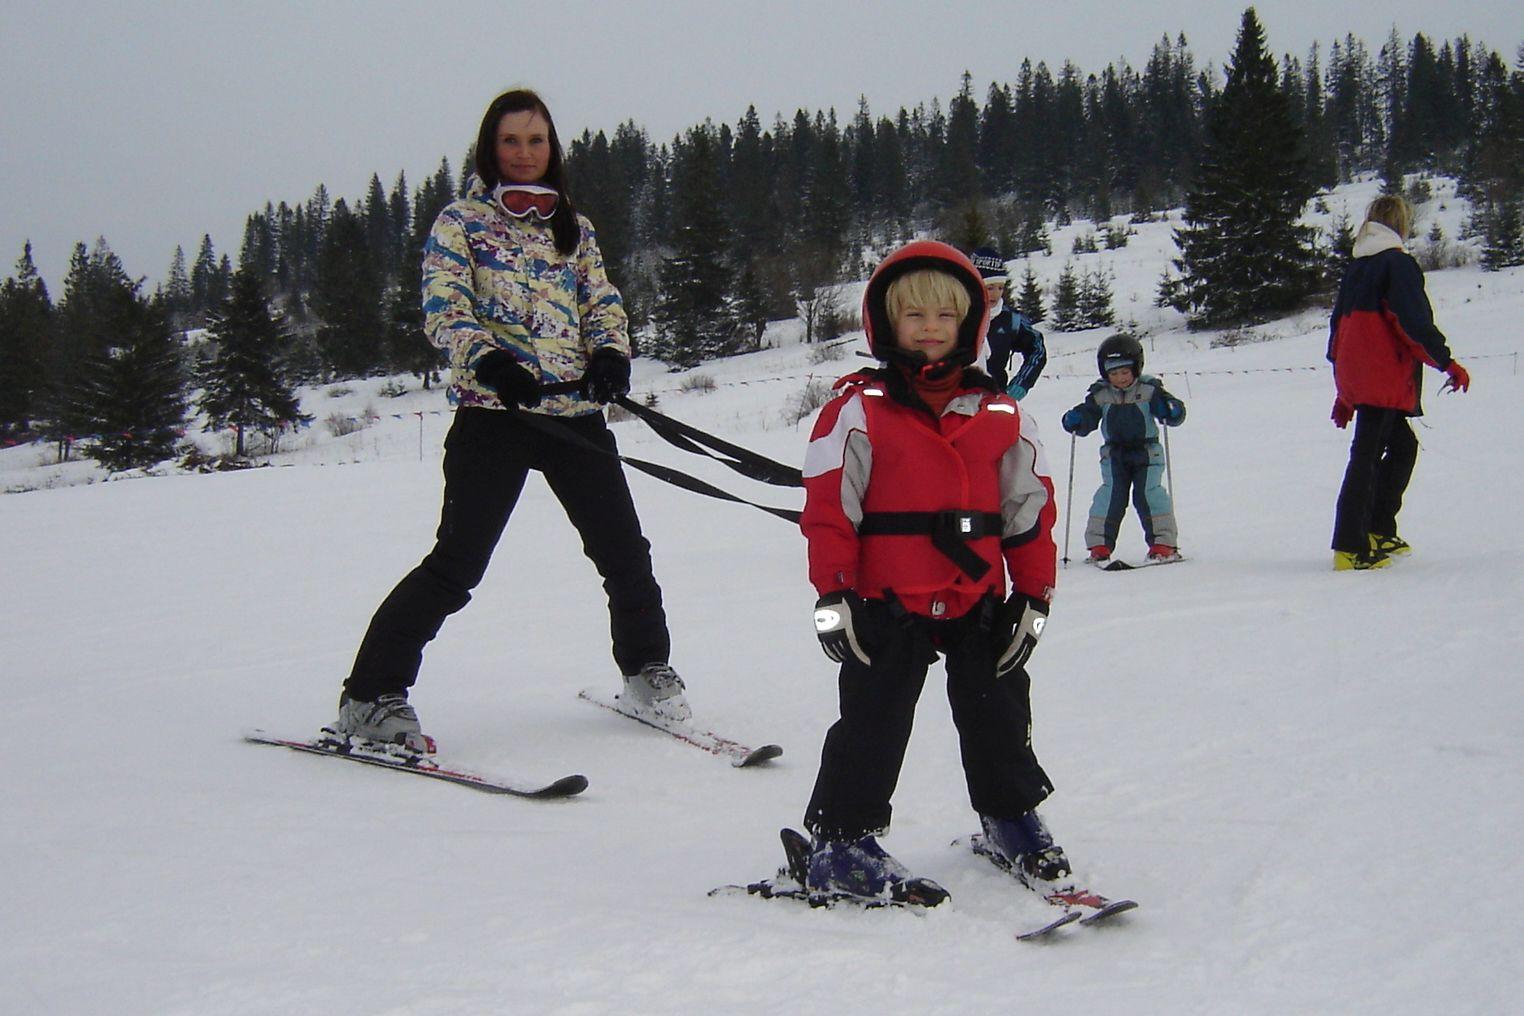 Kamizelka asekuracyjna na narty dla dziecka